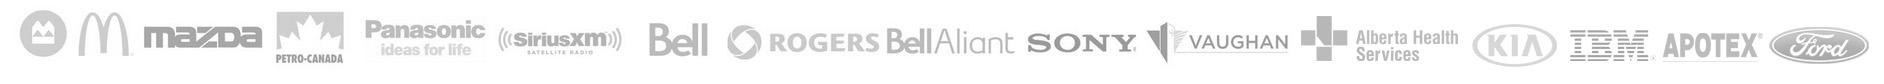 Ford, CIBC, Nortel, IBM, Nissan, Rogers, Bell, Bell Aliant